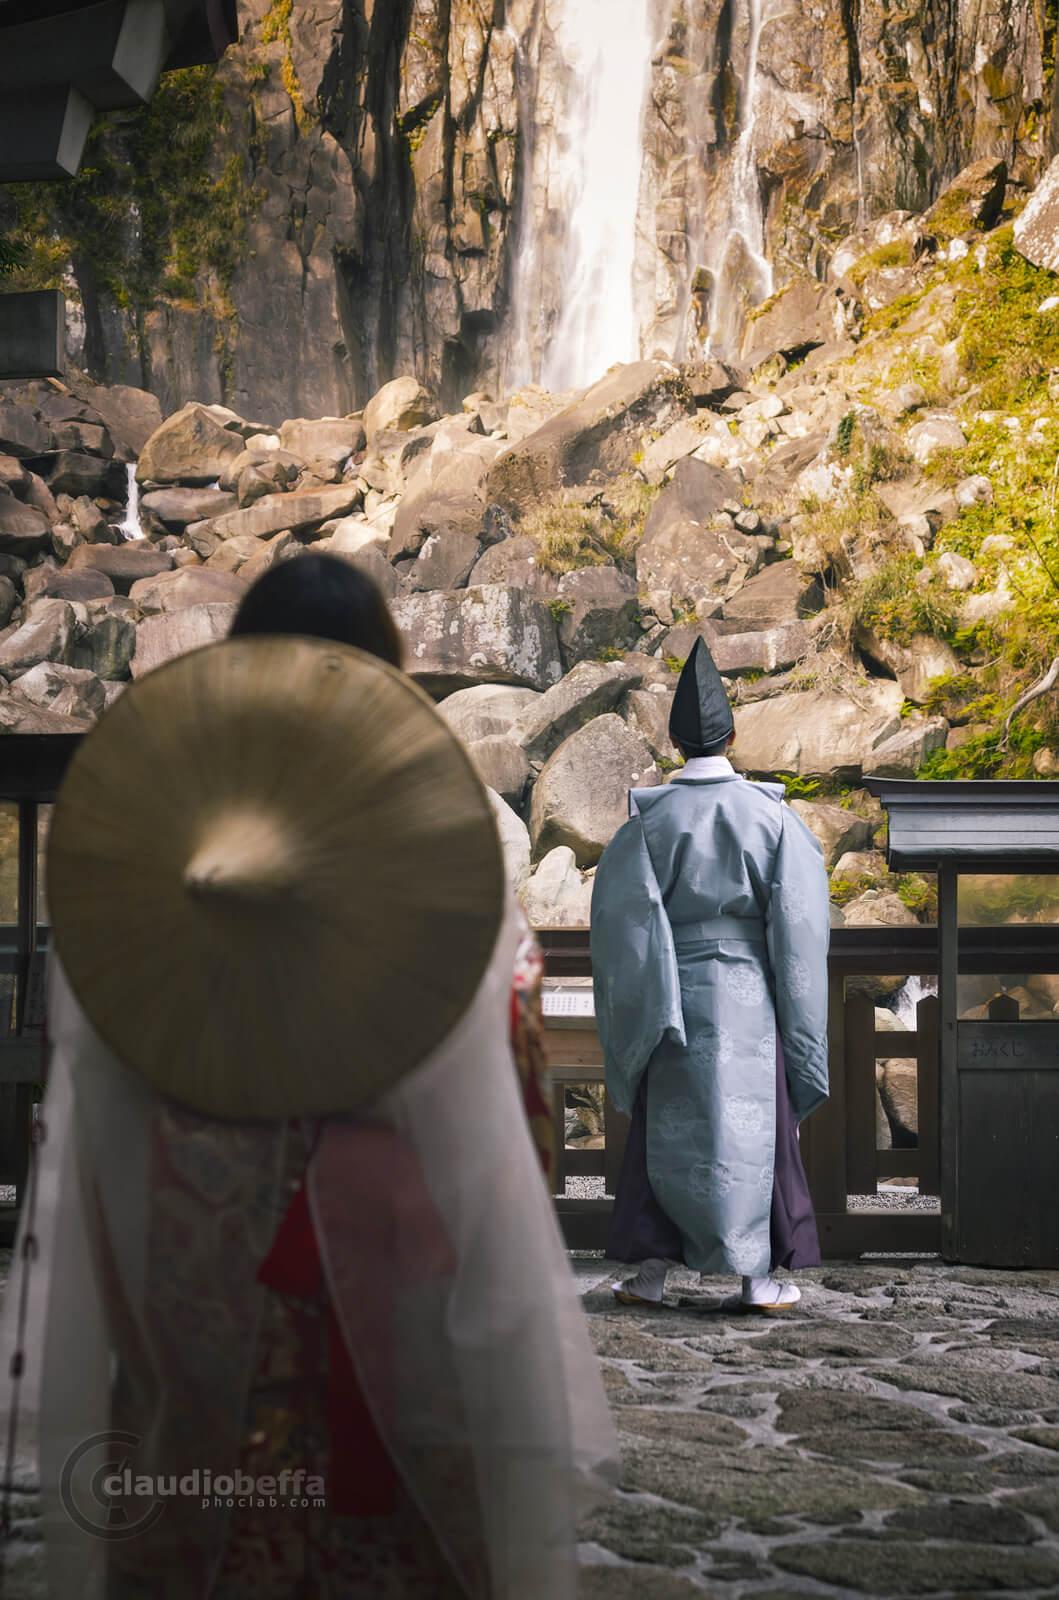 Tourists, Pilgrims, Kimono, Heian, Nachi no Taki, Waterfall, Hirou Shrine, Hiryu Gongen, Nature, Culture, Kii peninsula, Kumano, Japan